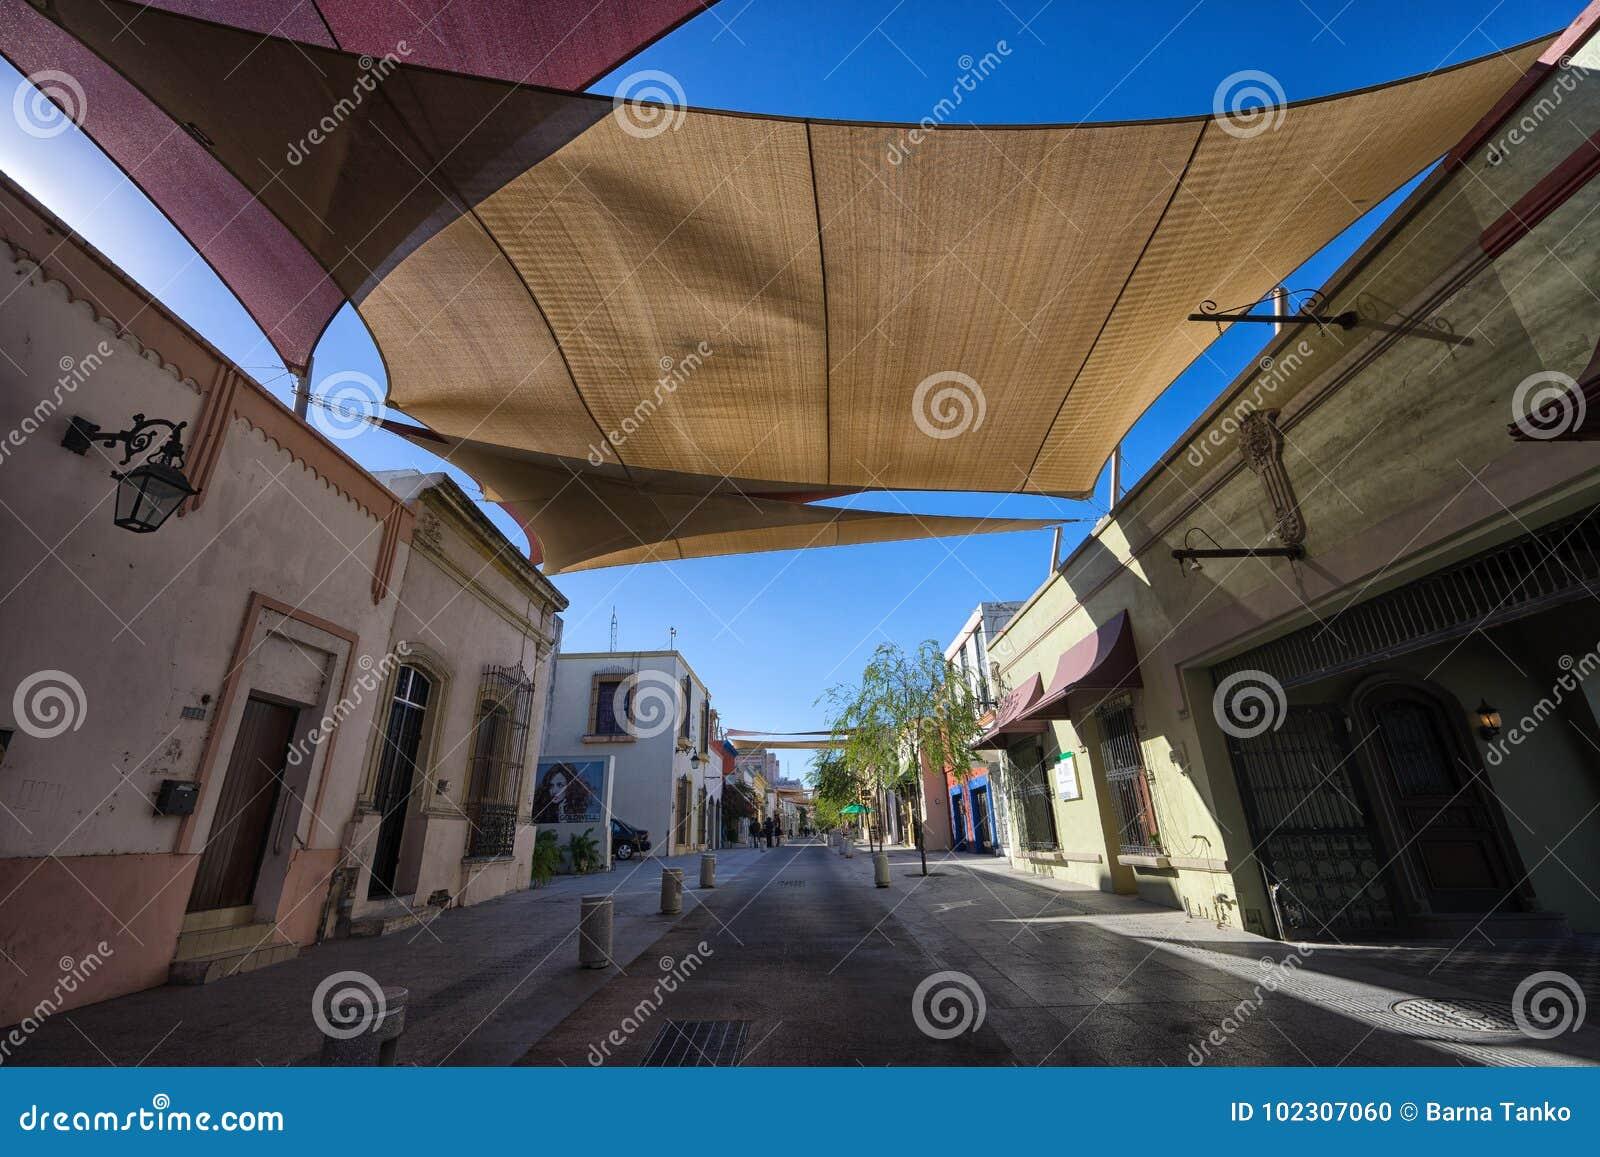 Barrio antiguo in Monterrey Mexico